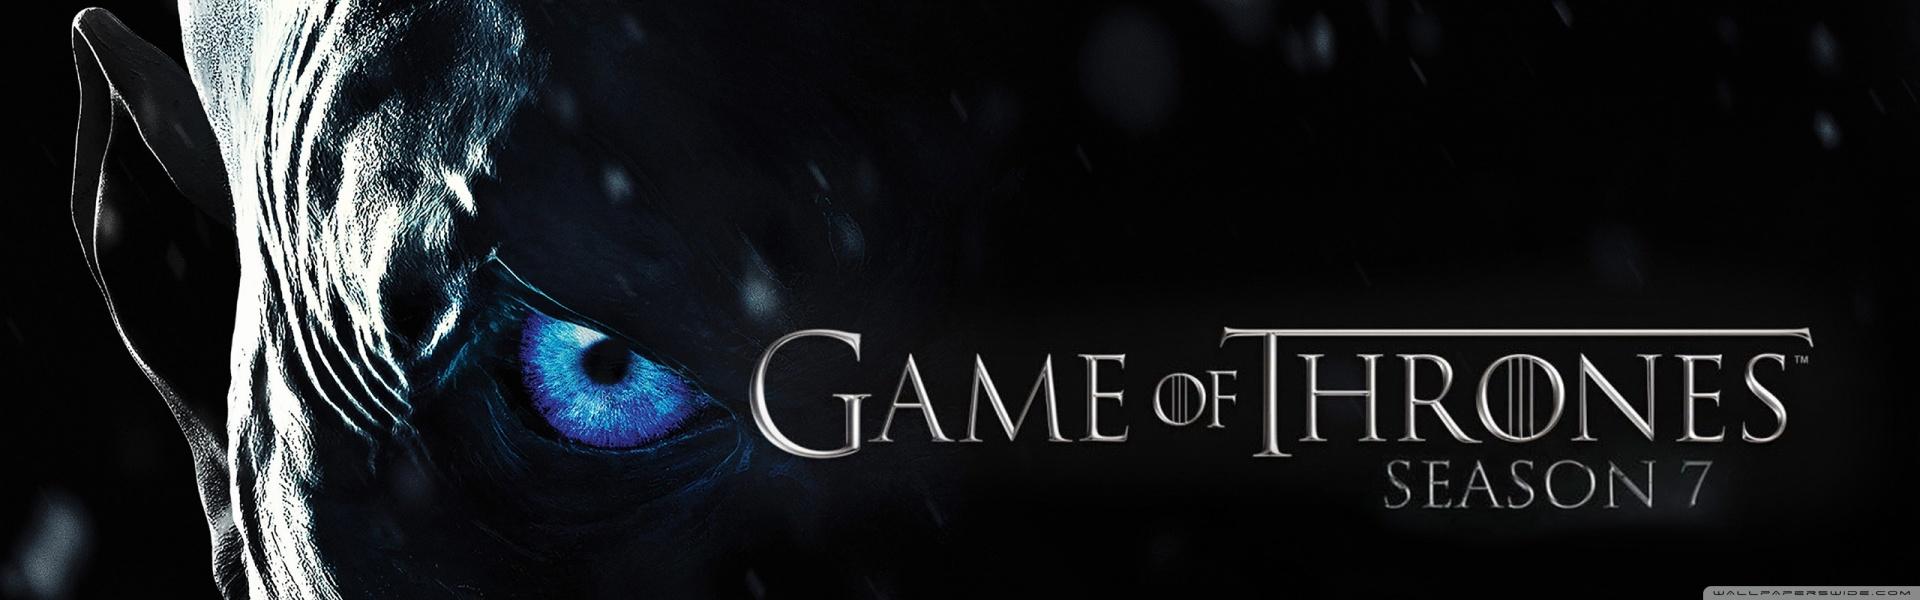 Game Of Thrones Season 7 4K HD Desktop Wallpaper for 4K Ultra 1920x600